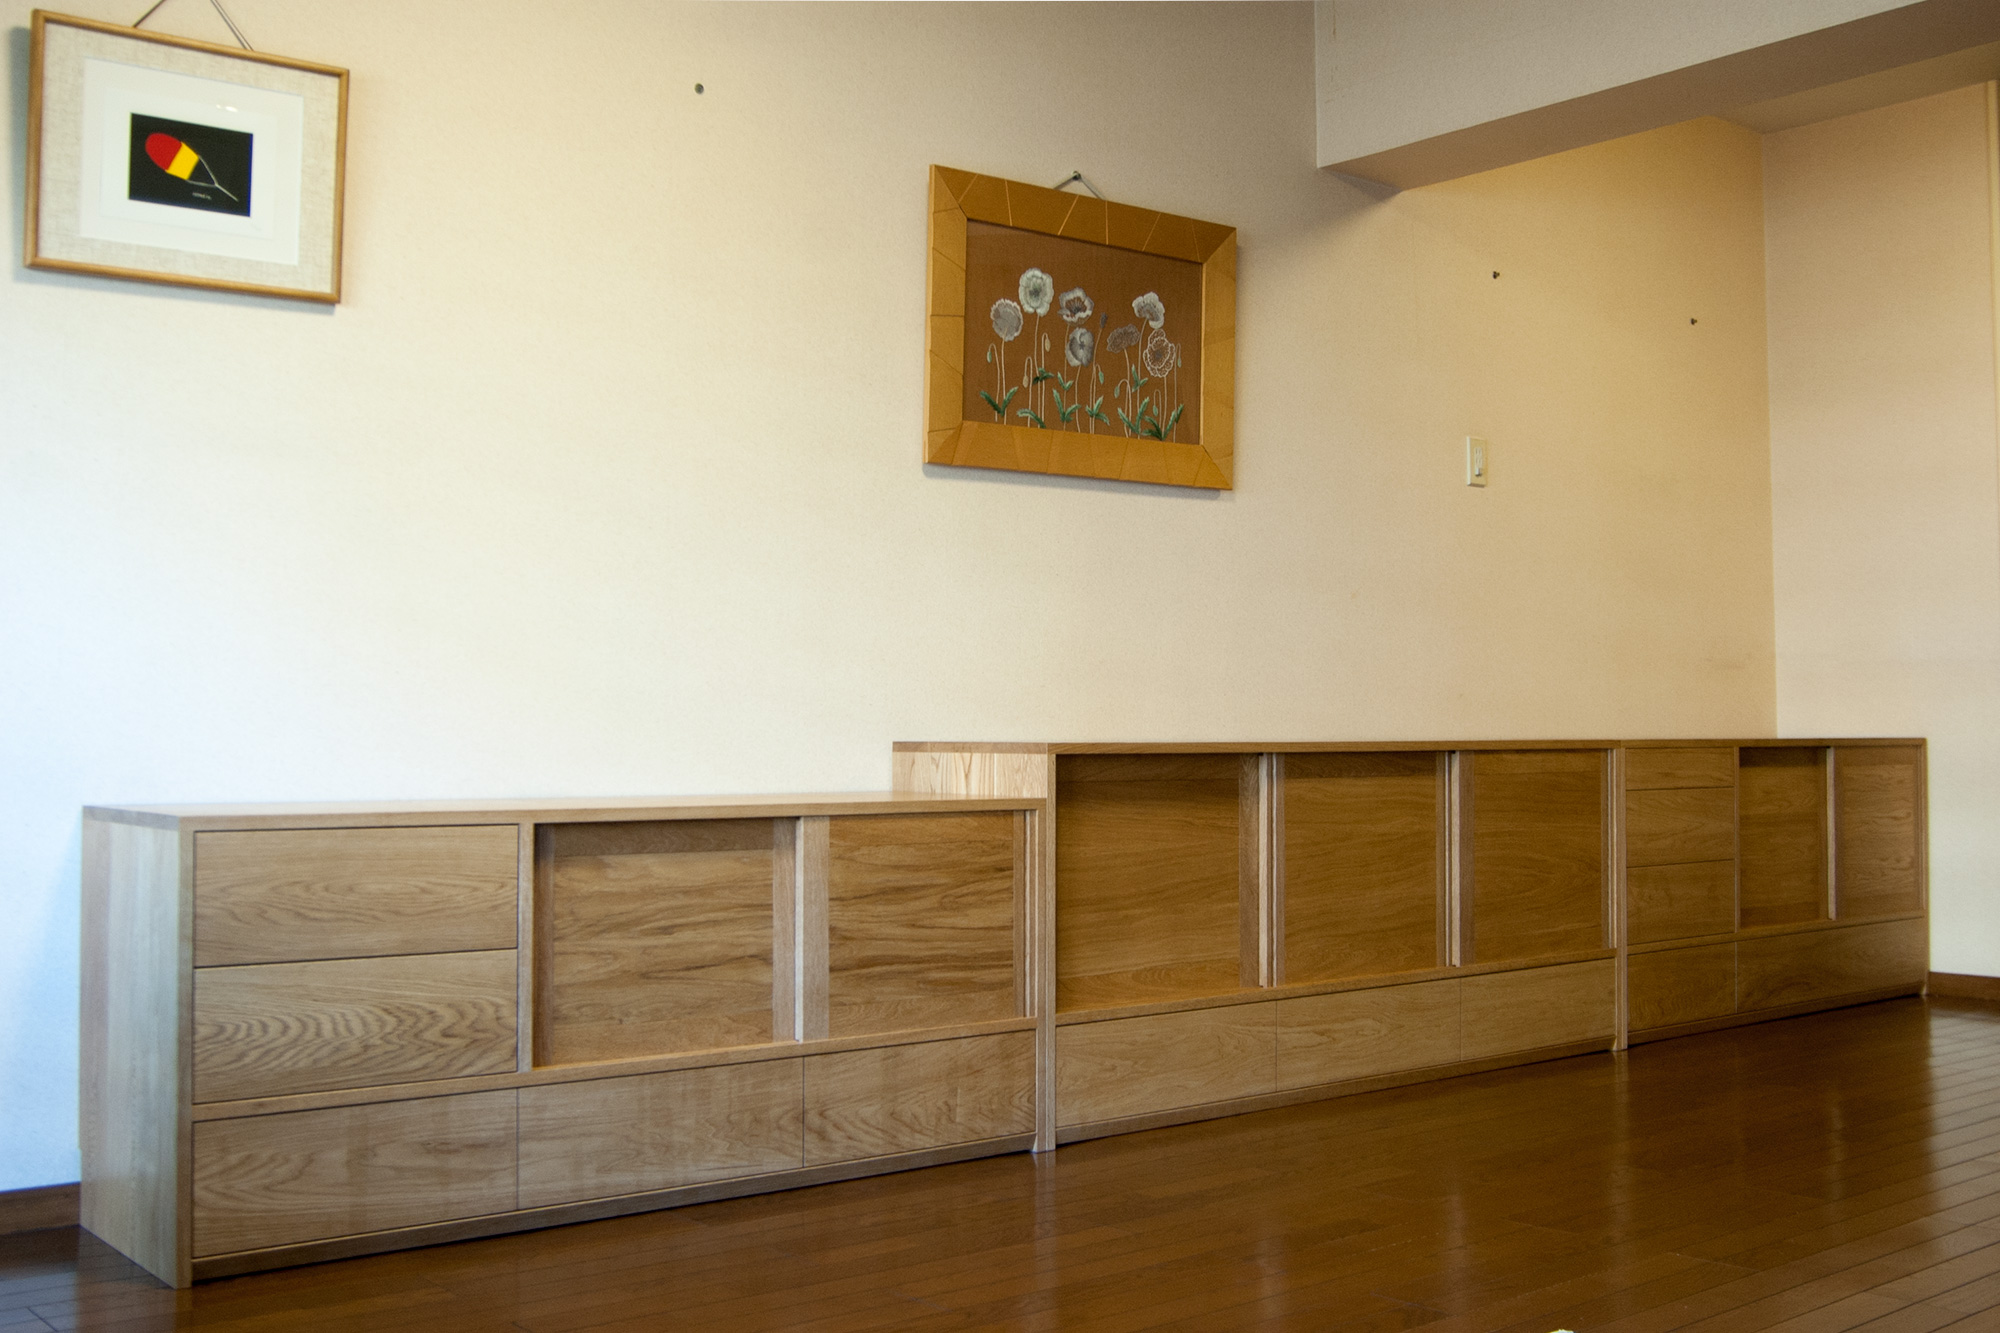 TANA収納棚とテレビボード